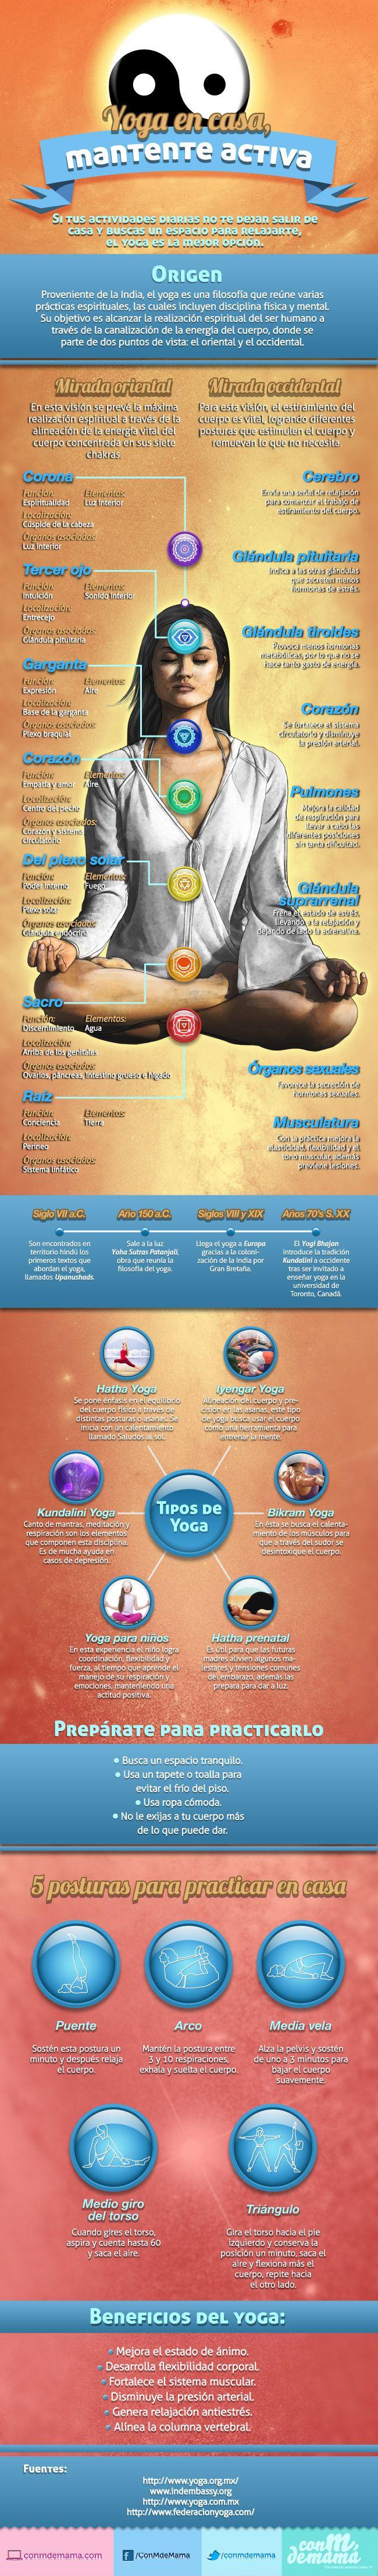 CMDM-YOGA-OKa #Infografía